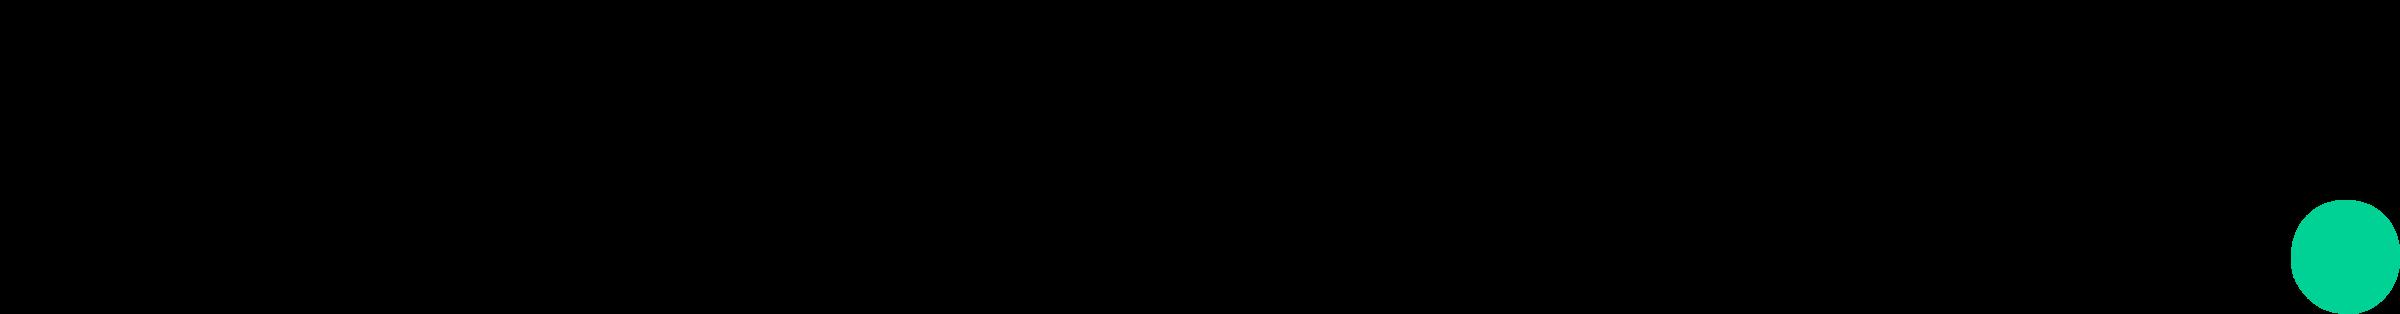 Conciso GmbH